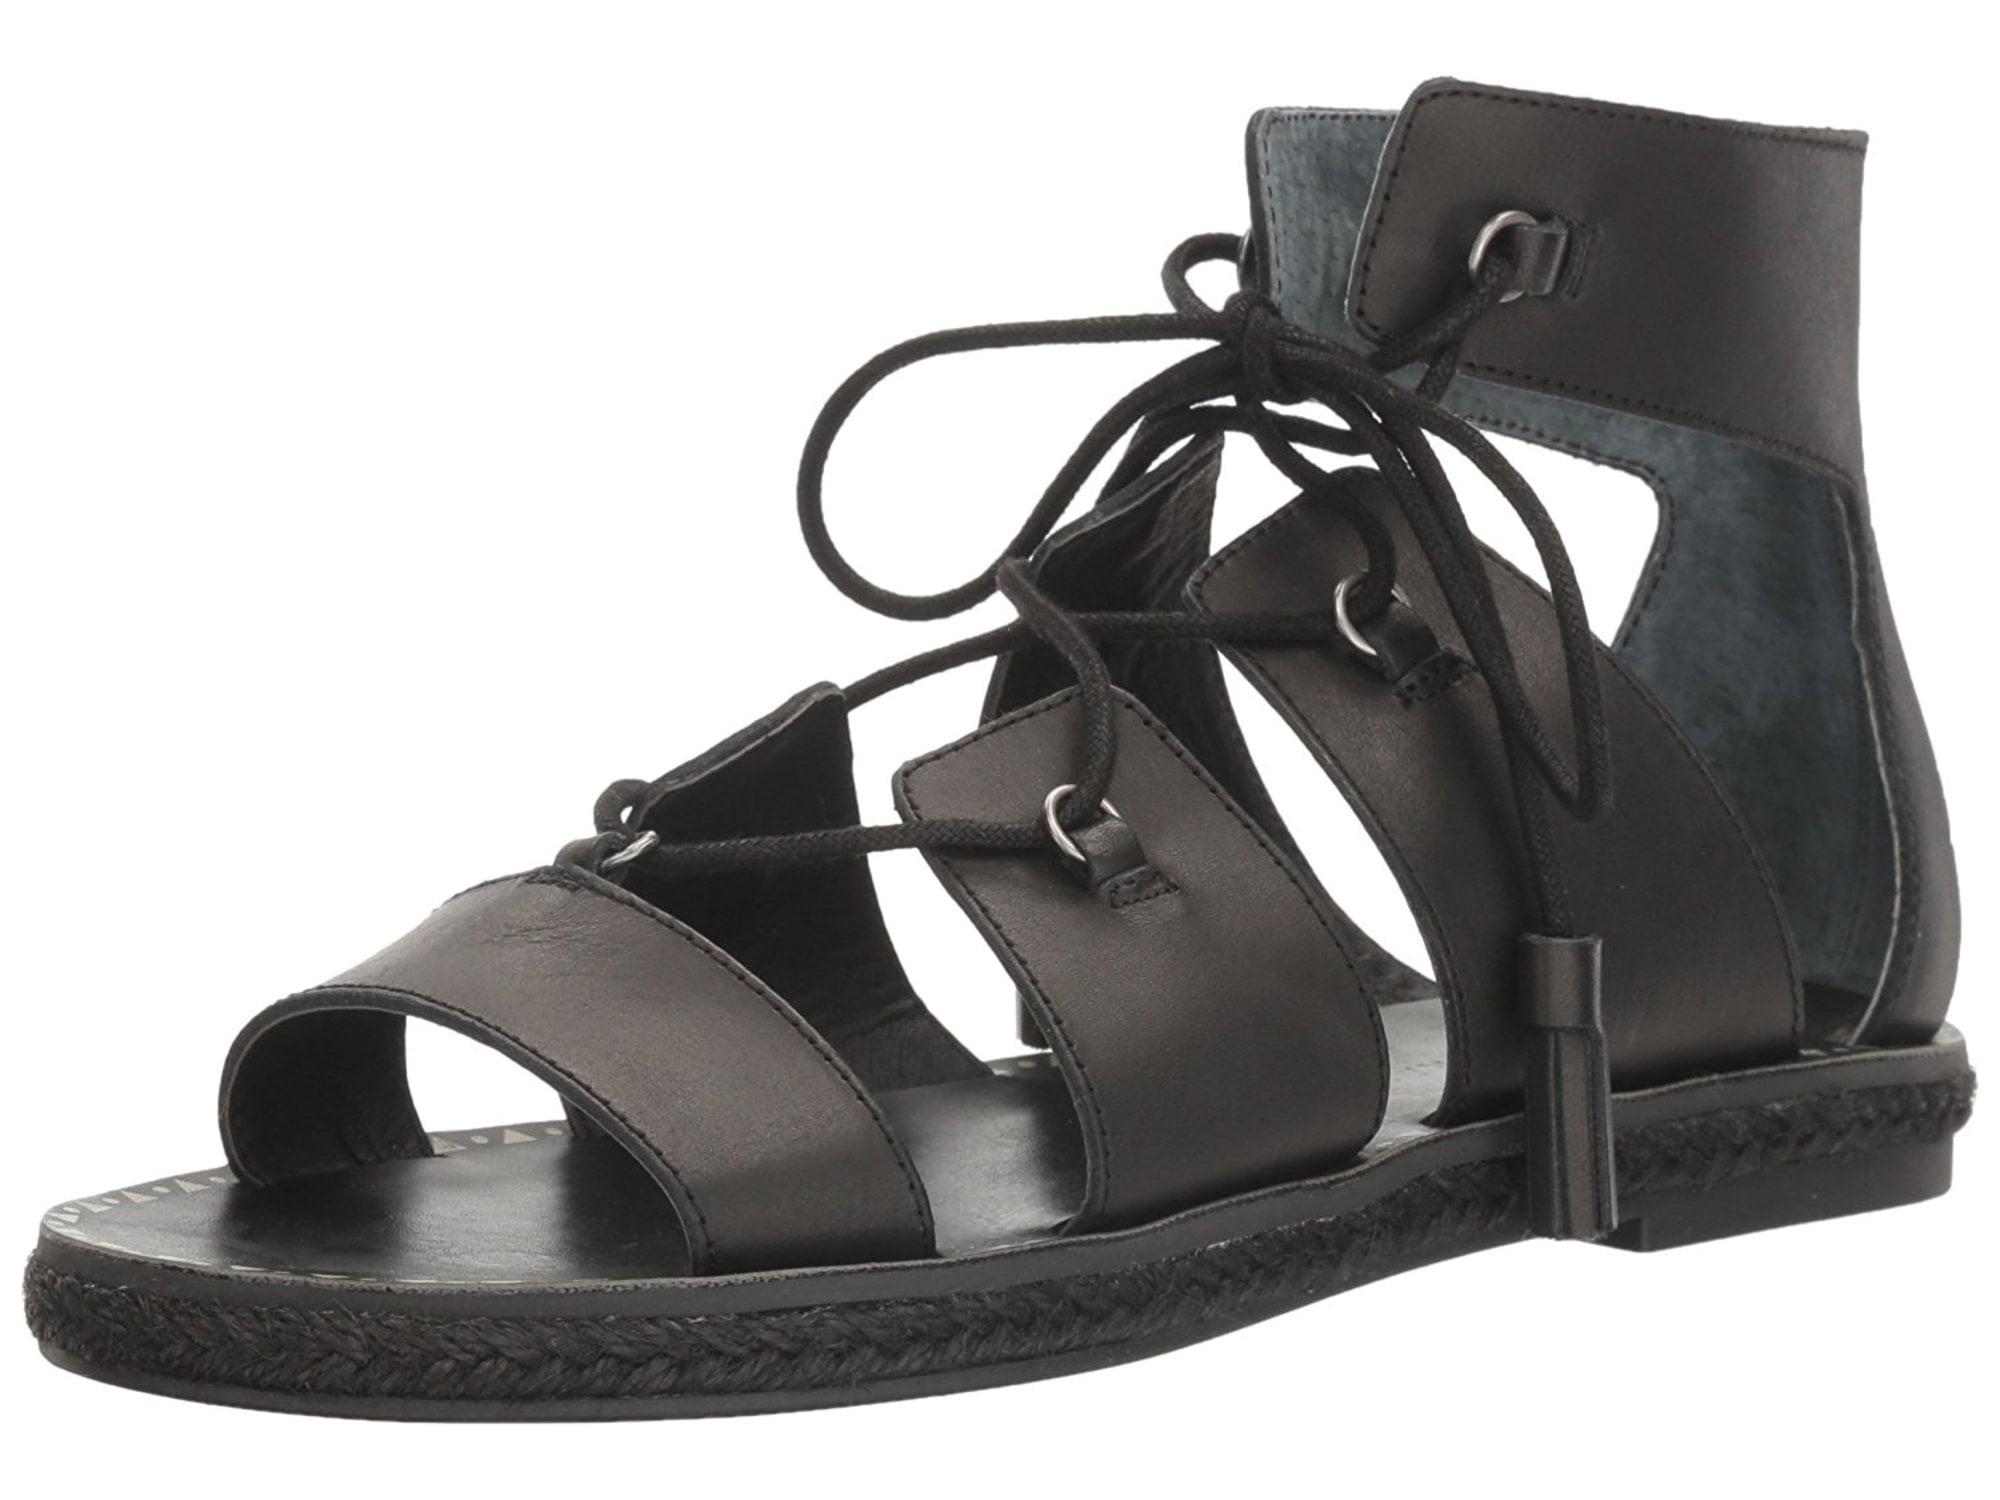 9b5bec77c542 Lucky Brand Womens LK-Dristel Open Toe Casual Gladiator Sandals ...